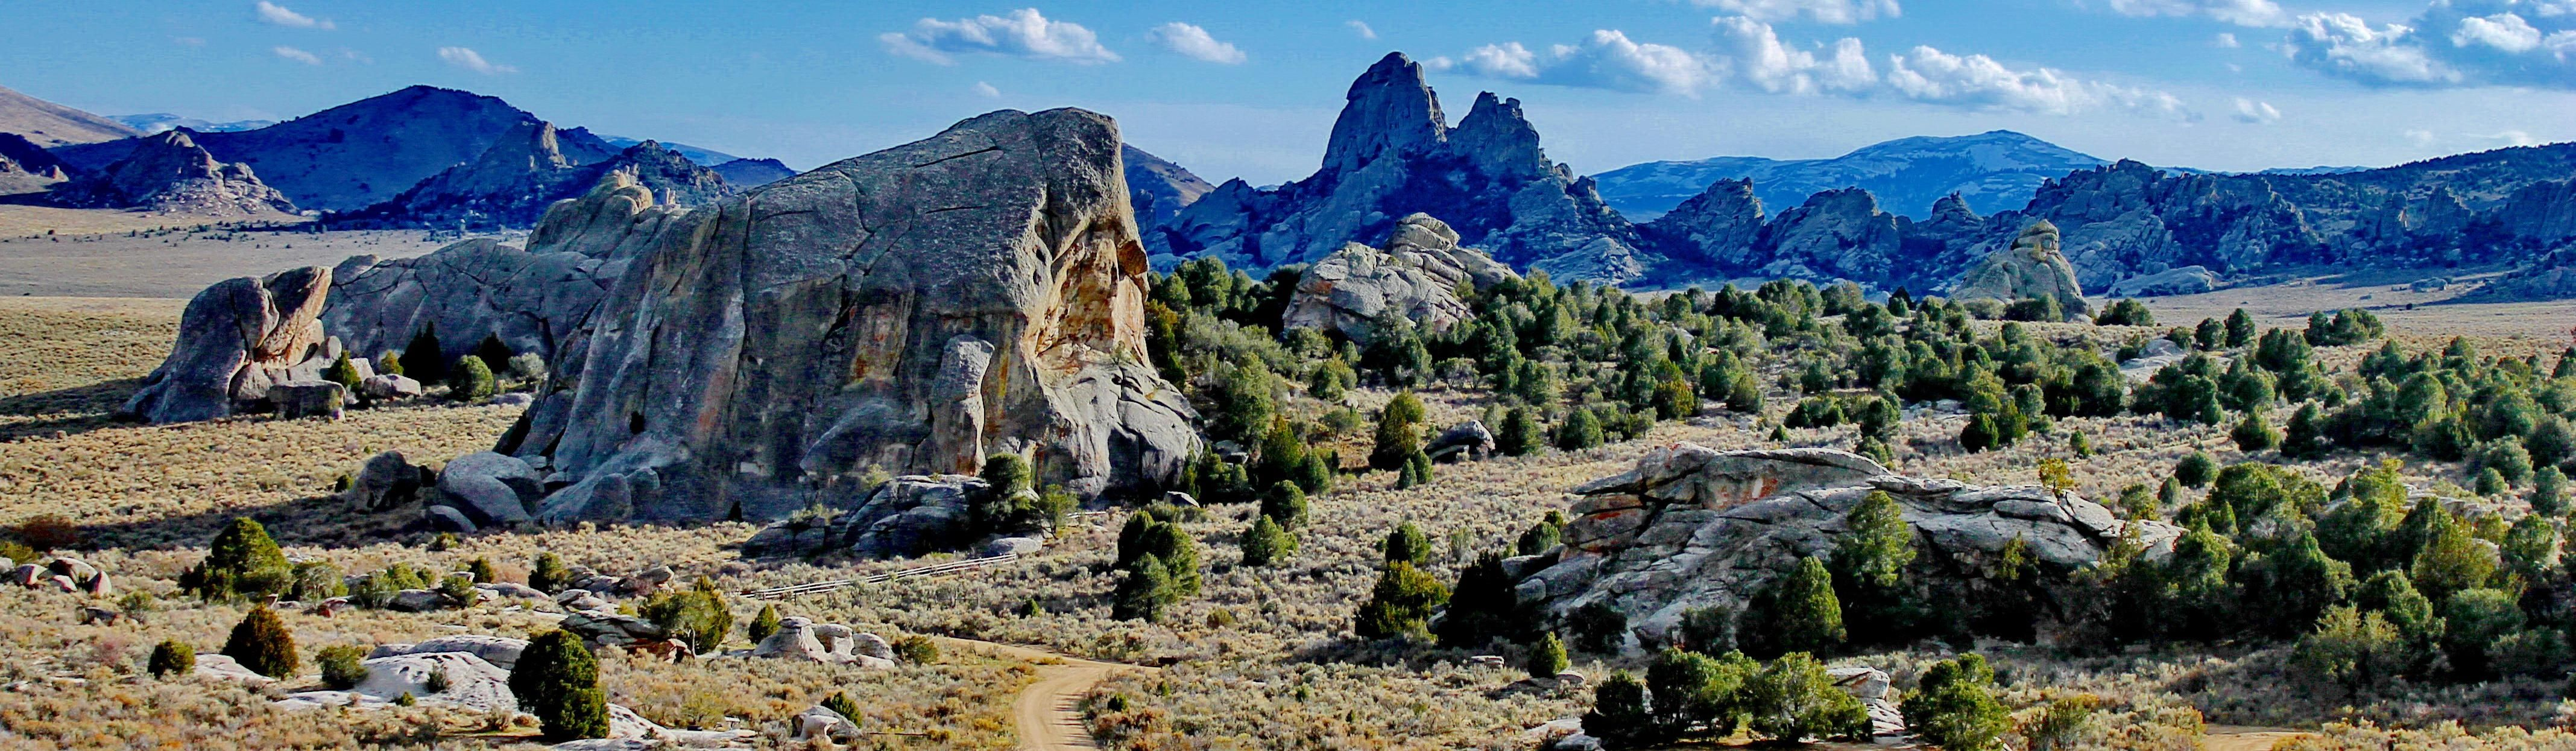 City Of Rocks National Reserve U S National Park Service Alma Idaho Dothis Granitecolumesspires Travel Idaho Park Service National Parks Go Usa